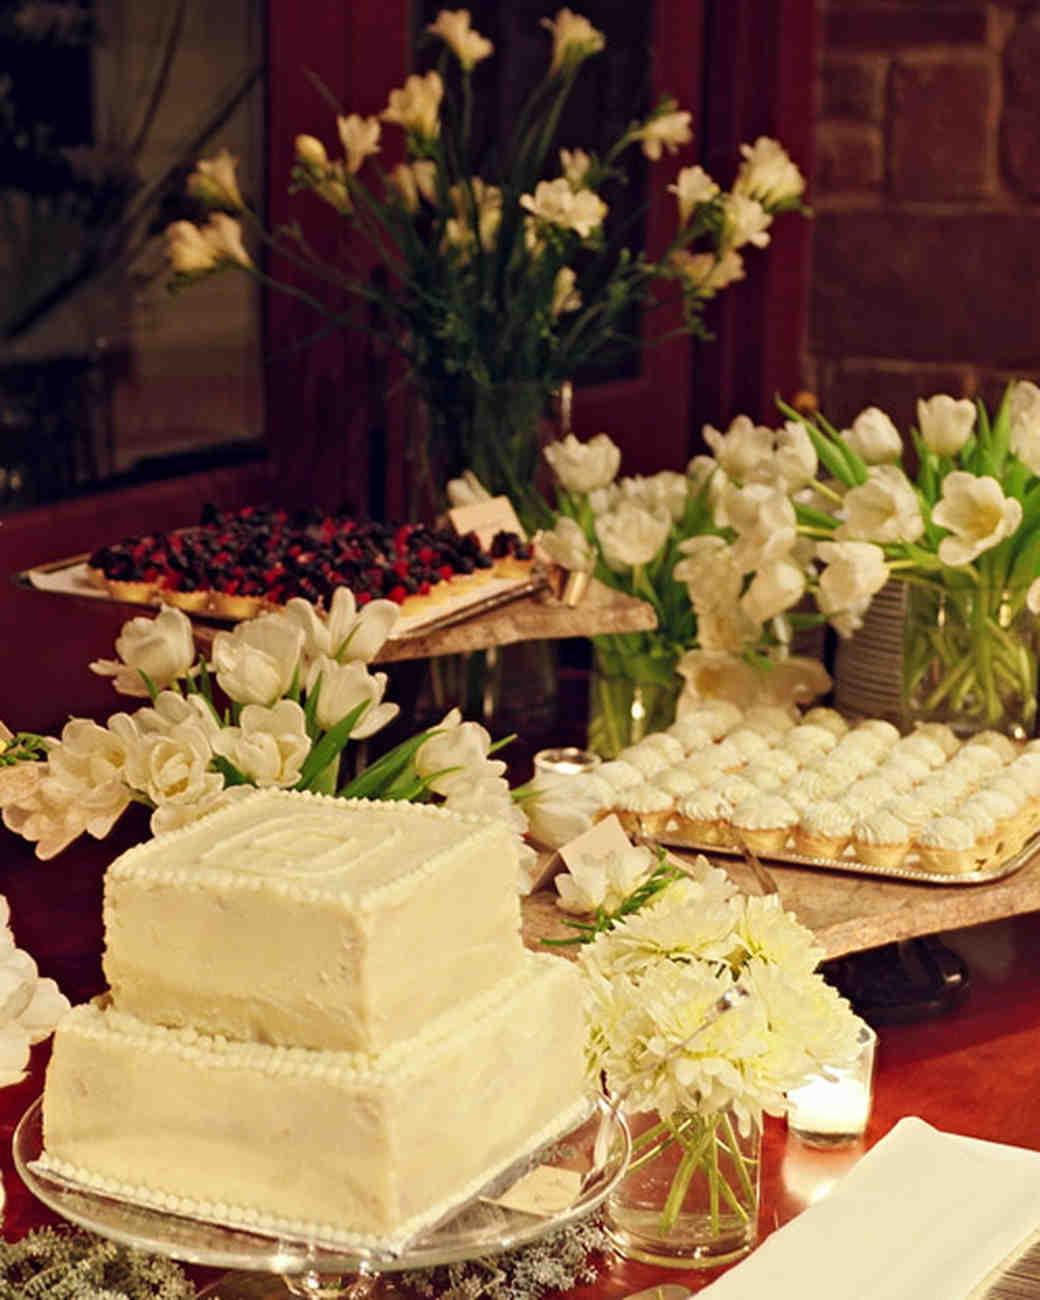 mw_0110_dessert.jpg